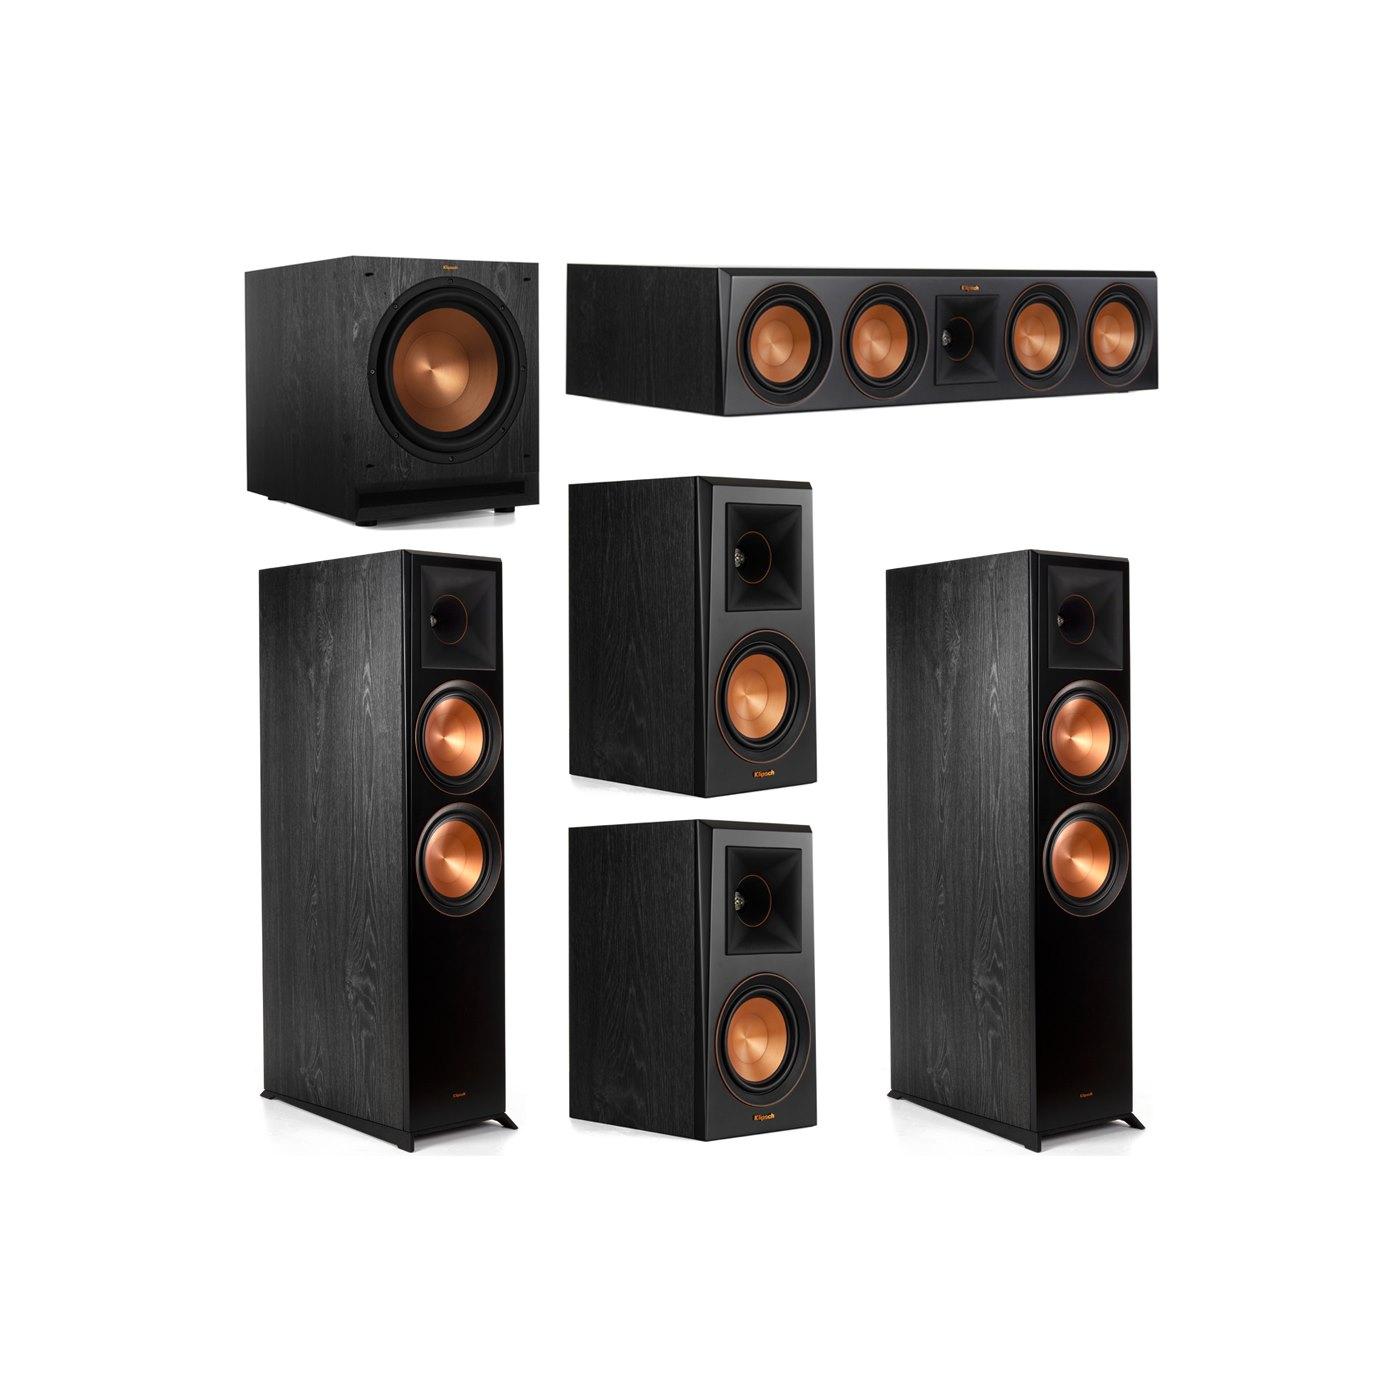 Klipsch 5.1 System with 2 RP-8000F Floorstanding Speakers, 1 Klipsch RP-504C Center Speaker, 2 Klipsch RP-500M Surround Speakers, 1 Klipsch SPL-120 Subwoofer